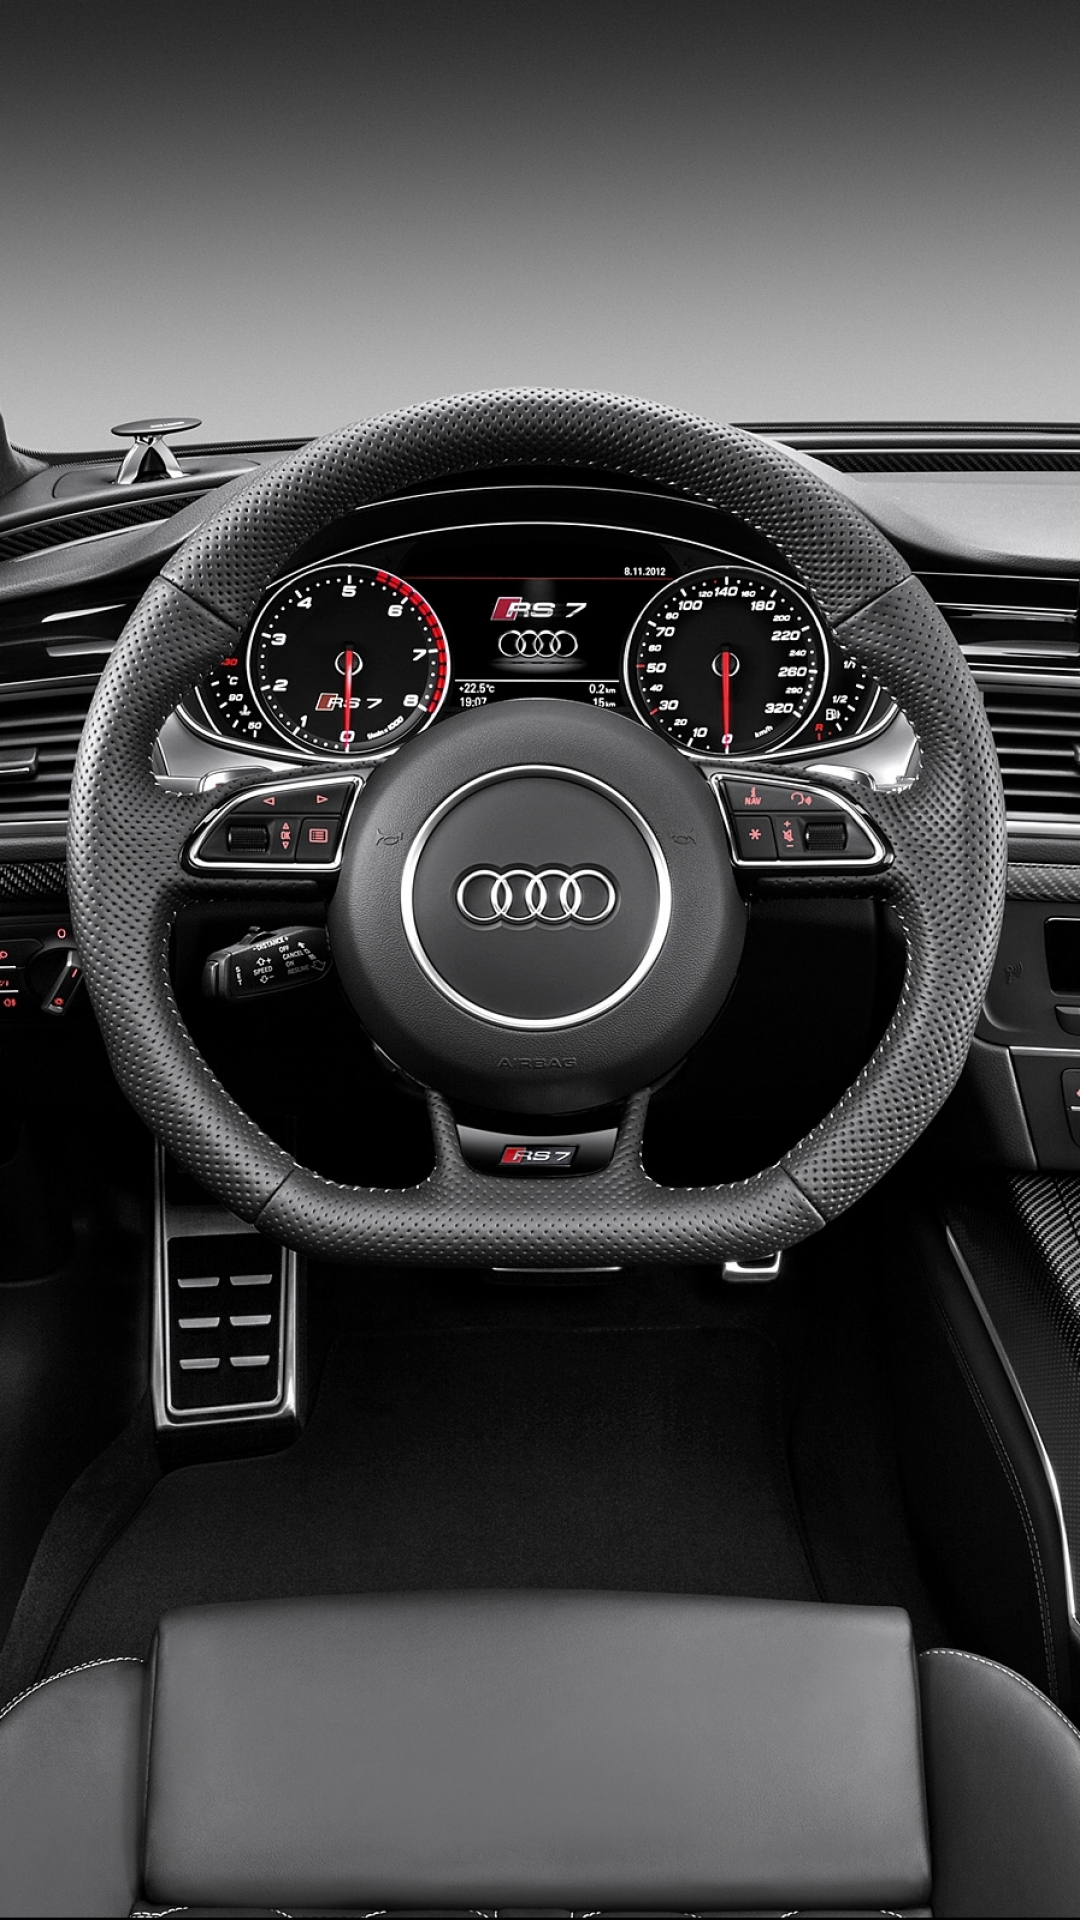 Audi Rs7 2013 Interior 1080x1920 Download Hd Wallpaper Wallpapertip